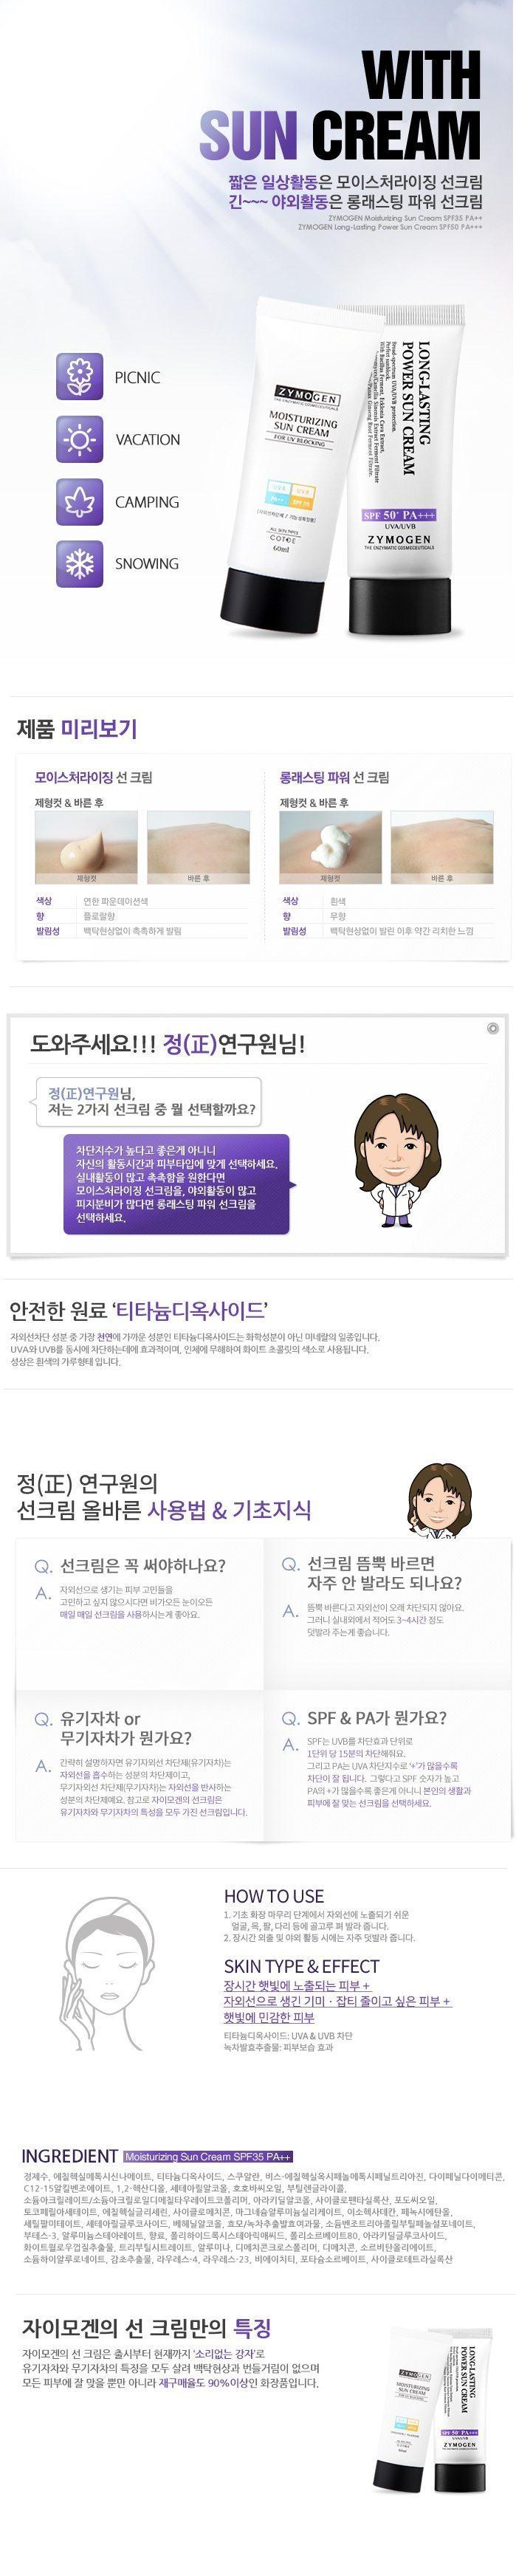 Zymogen Moisturizing Sun Cream korean cosmetic skincar product online shop malaysia brazil macau1